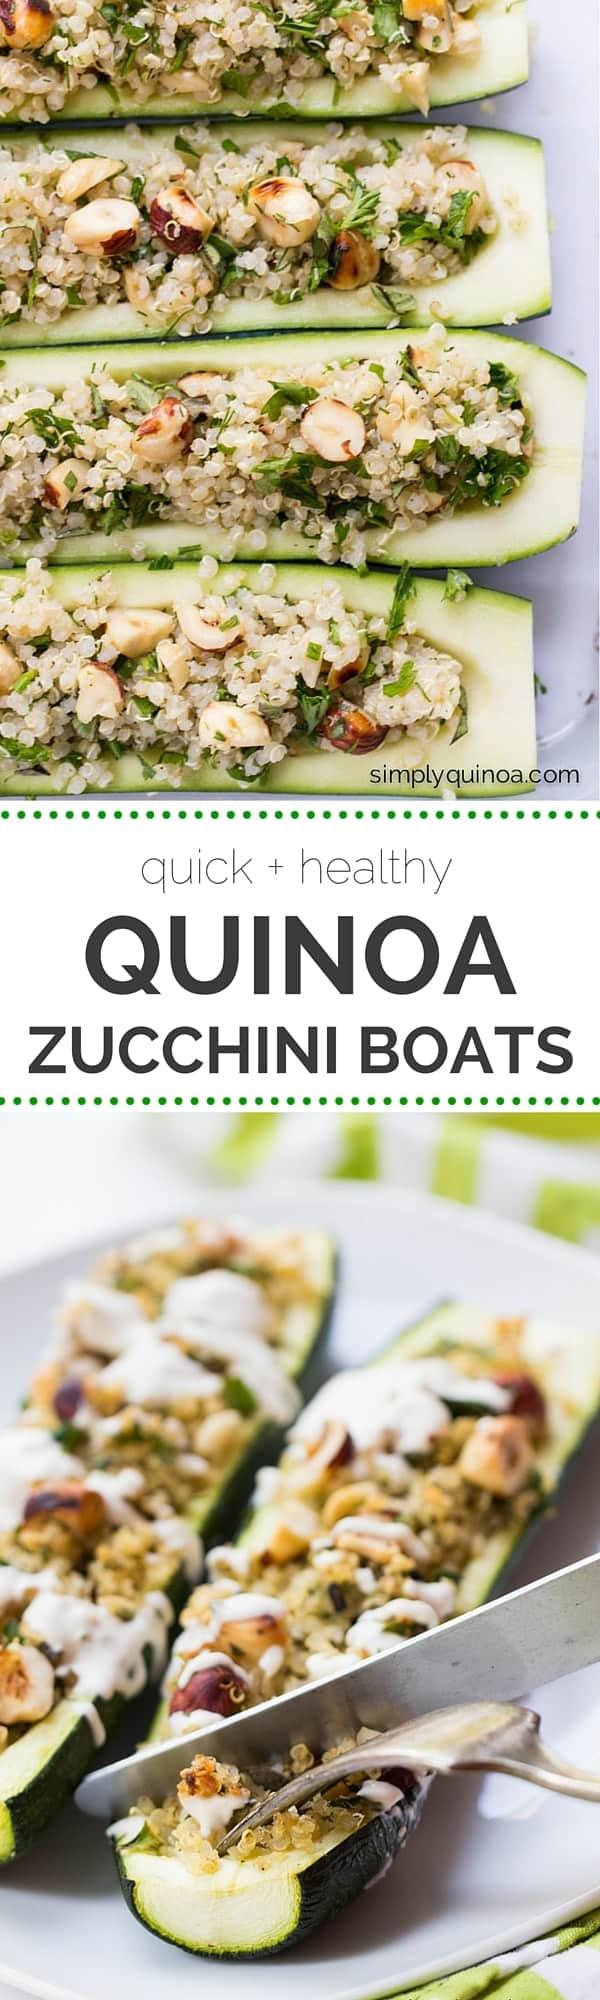 These super quick Quinoa Zucchini Boats make for a healthy + delicious weeknight meal | recipe on simplyquinoa.com